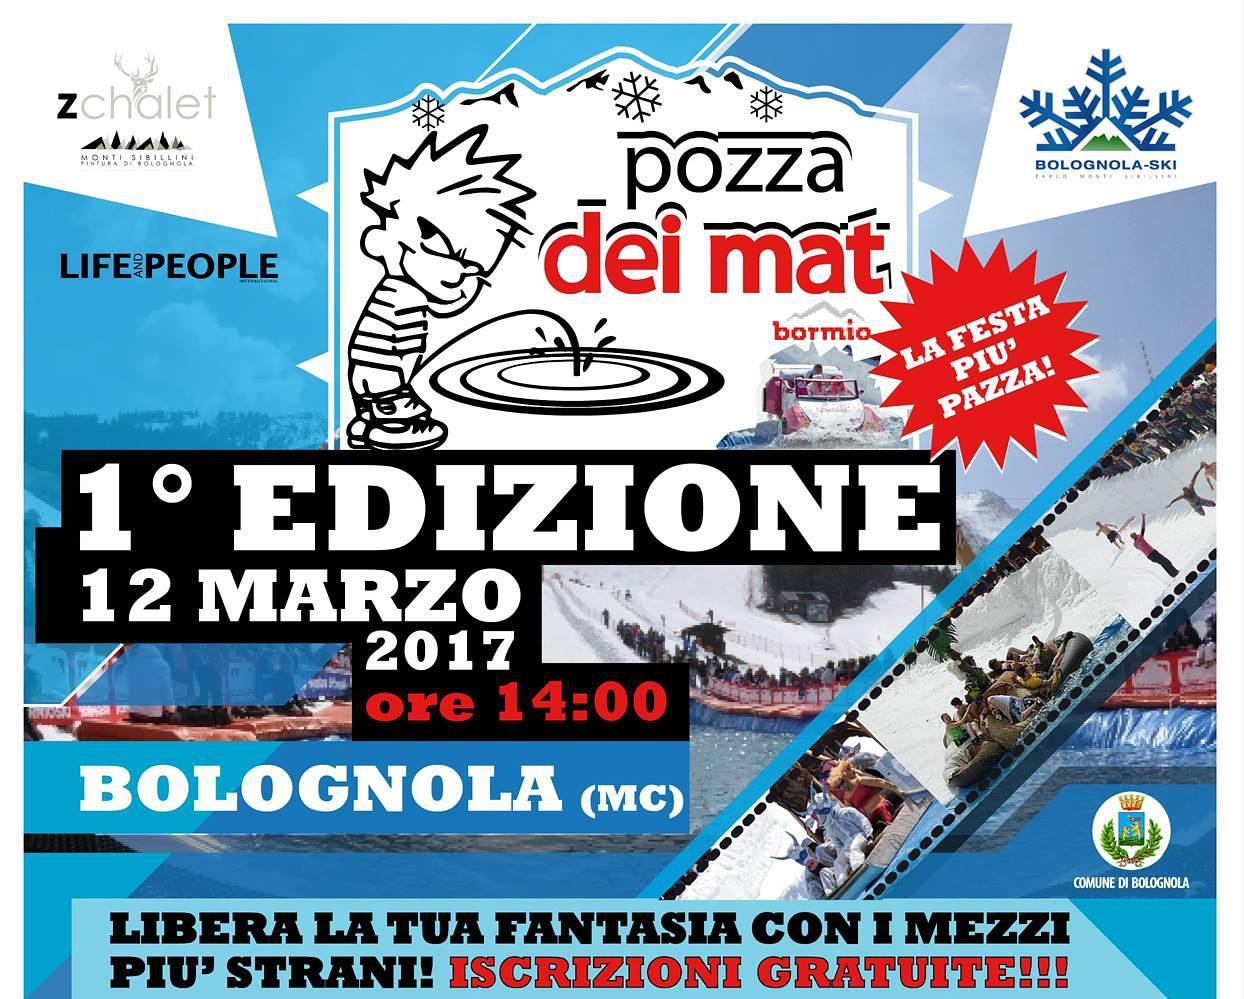 Locandina evento Pozza dei Mat a Bolognola